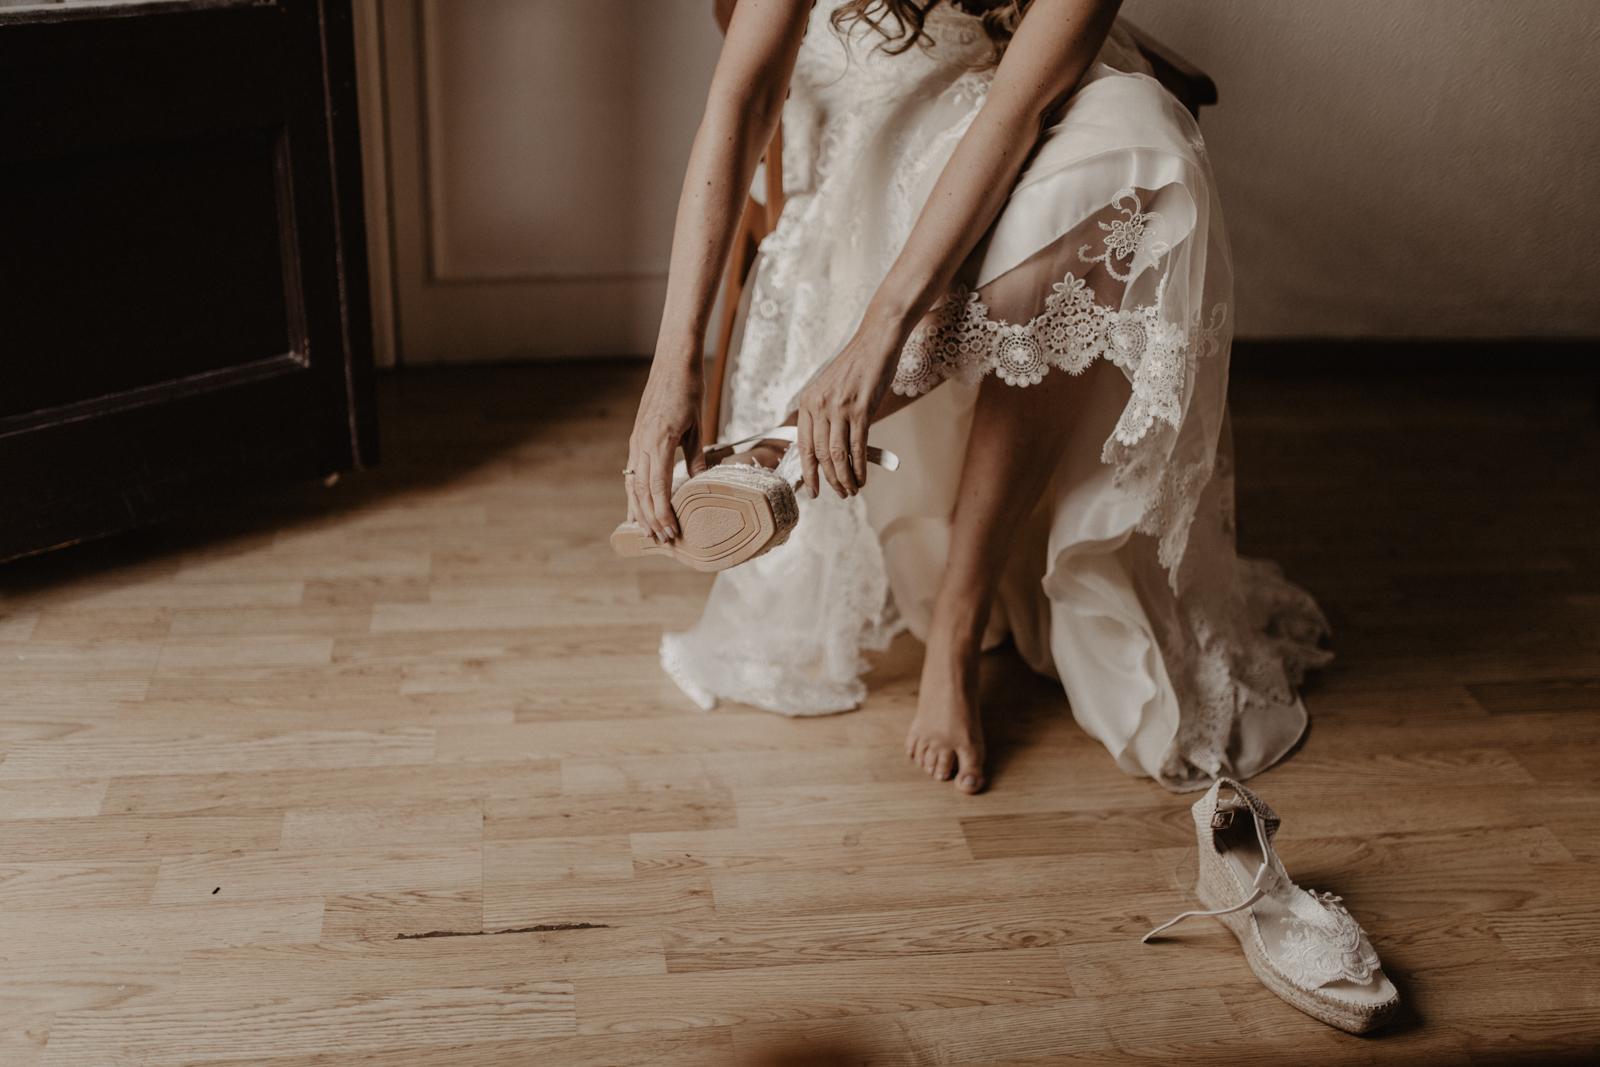 thenortherngirlphotography_photography_thenortherngirl_rebeccascabros_wedding_weddingphotography_weddingphotographer_barcelona_bodaenbarcelona_bodaenmaselmarti_bodarogeryvane-203.jpg